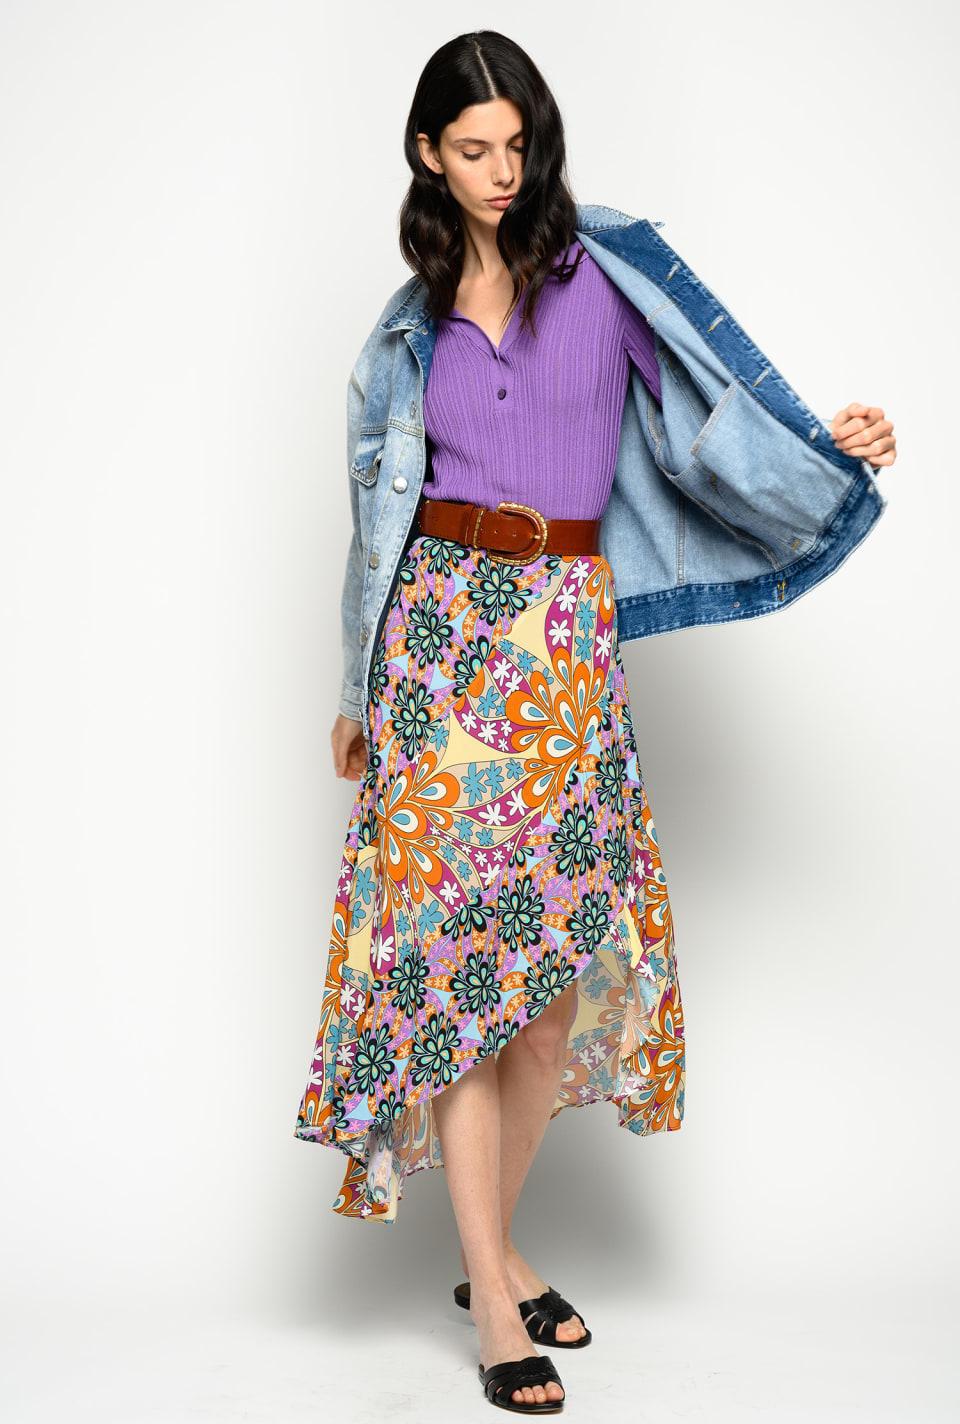 Falda floral